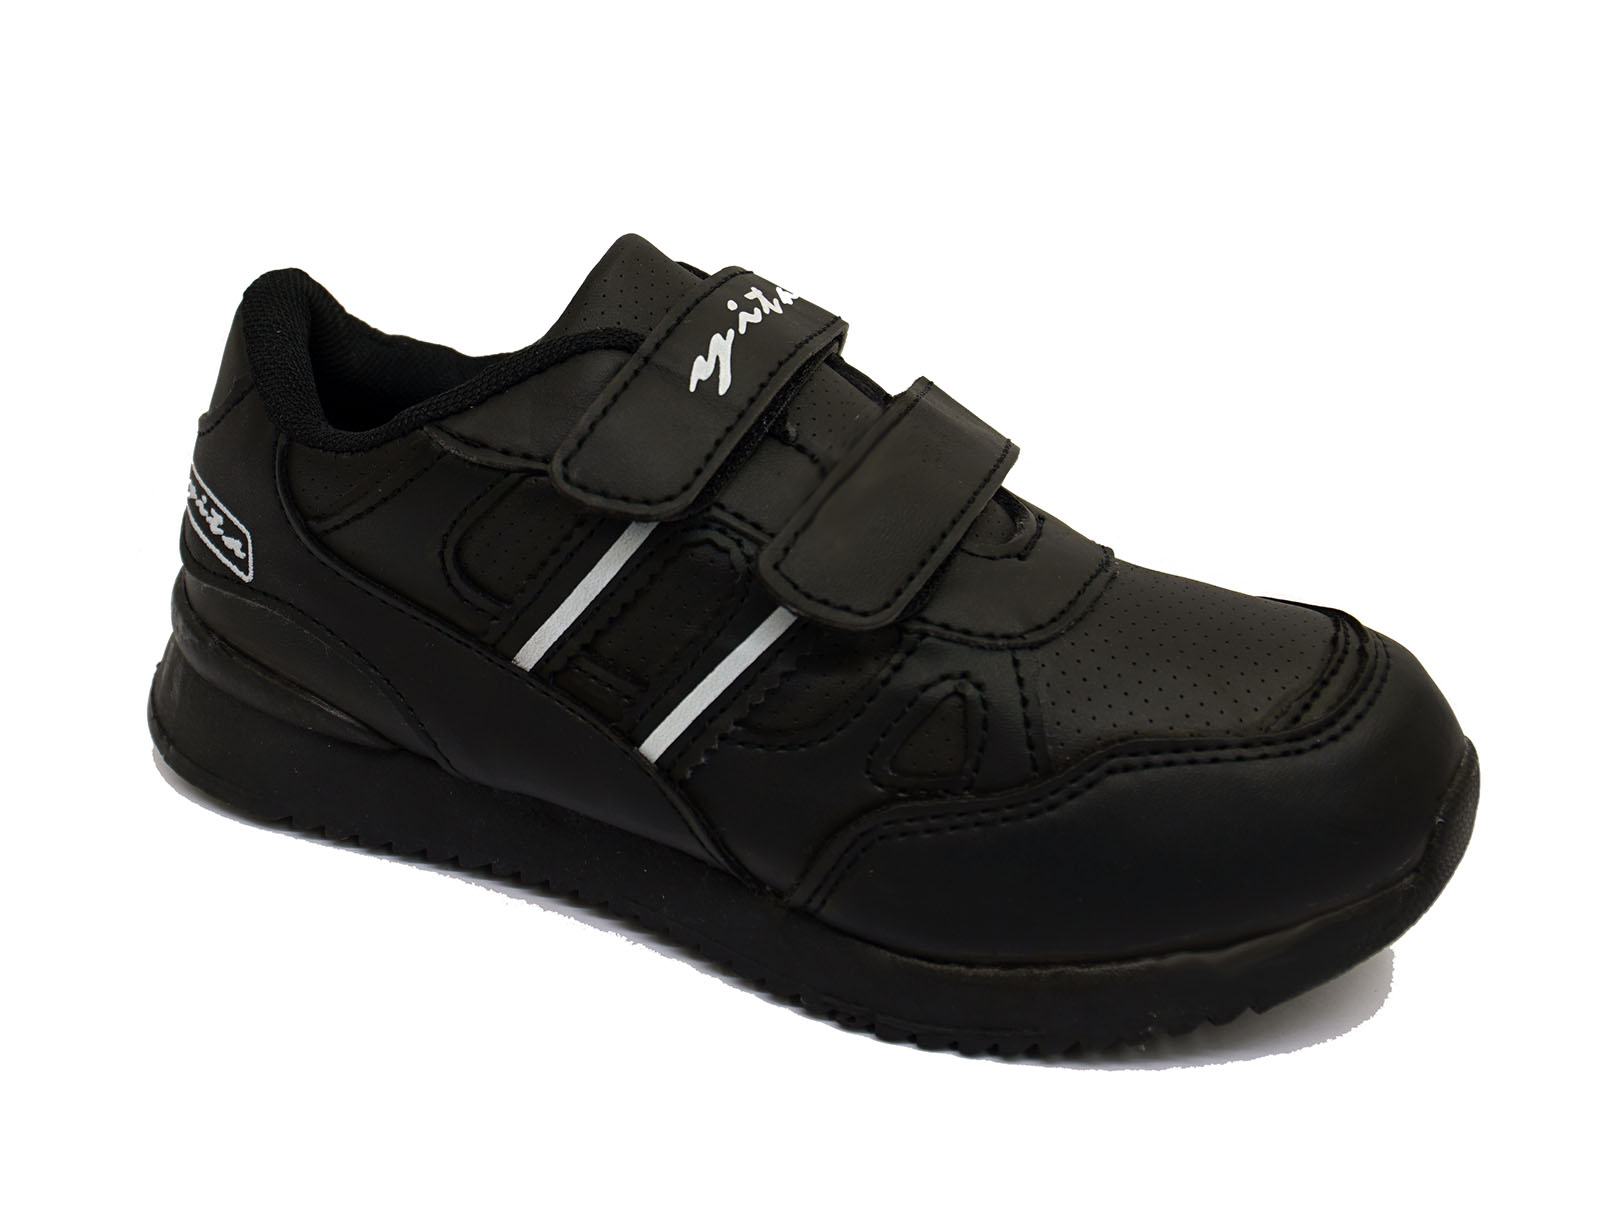 Niños Niñas Niños Childrens Negro Deportes Entrenadores Zapatos Escolares Playera Zapatos De Salón 12-3